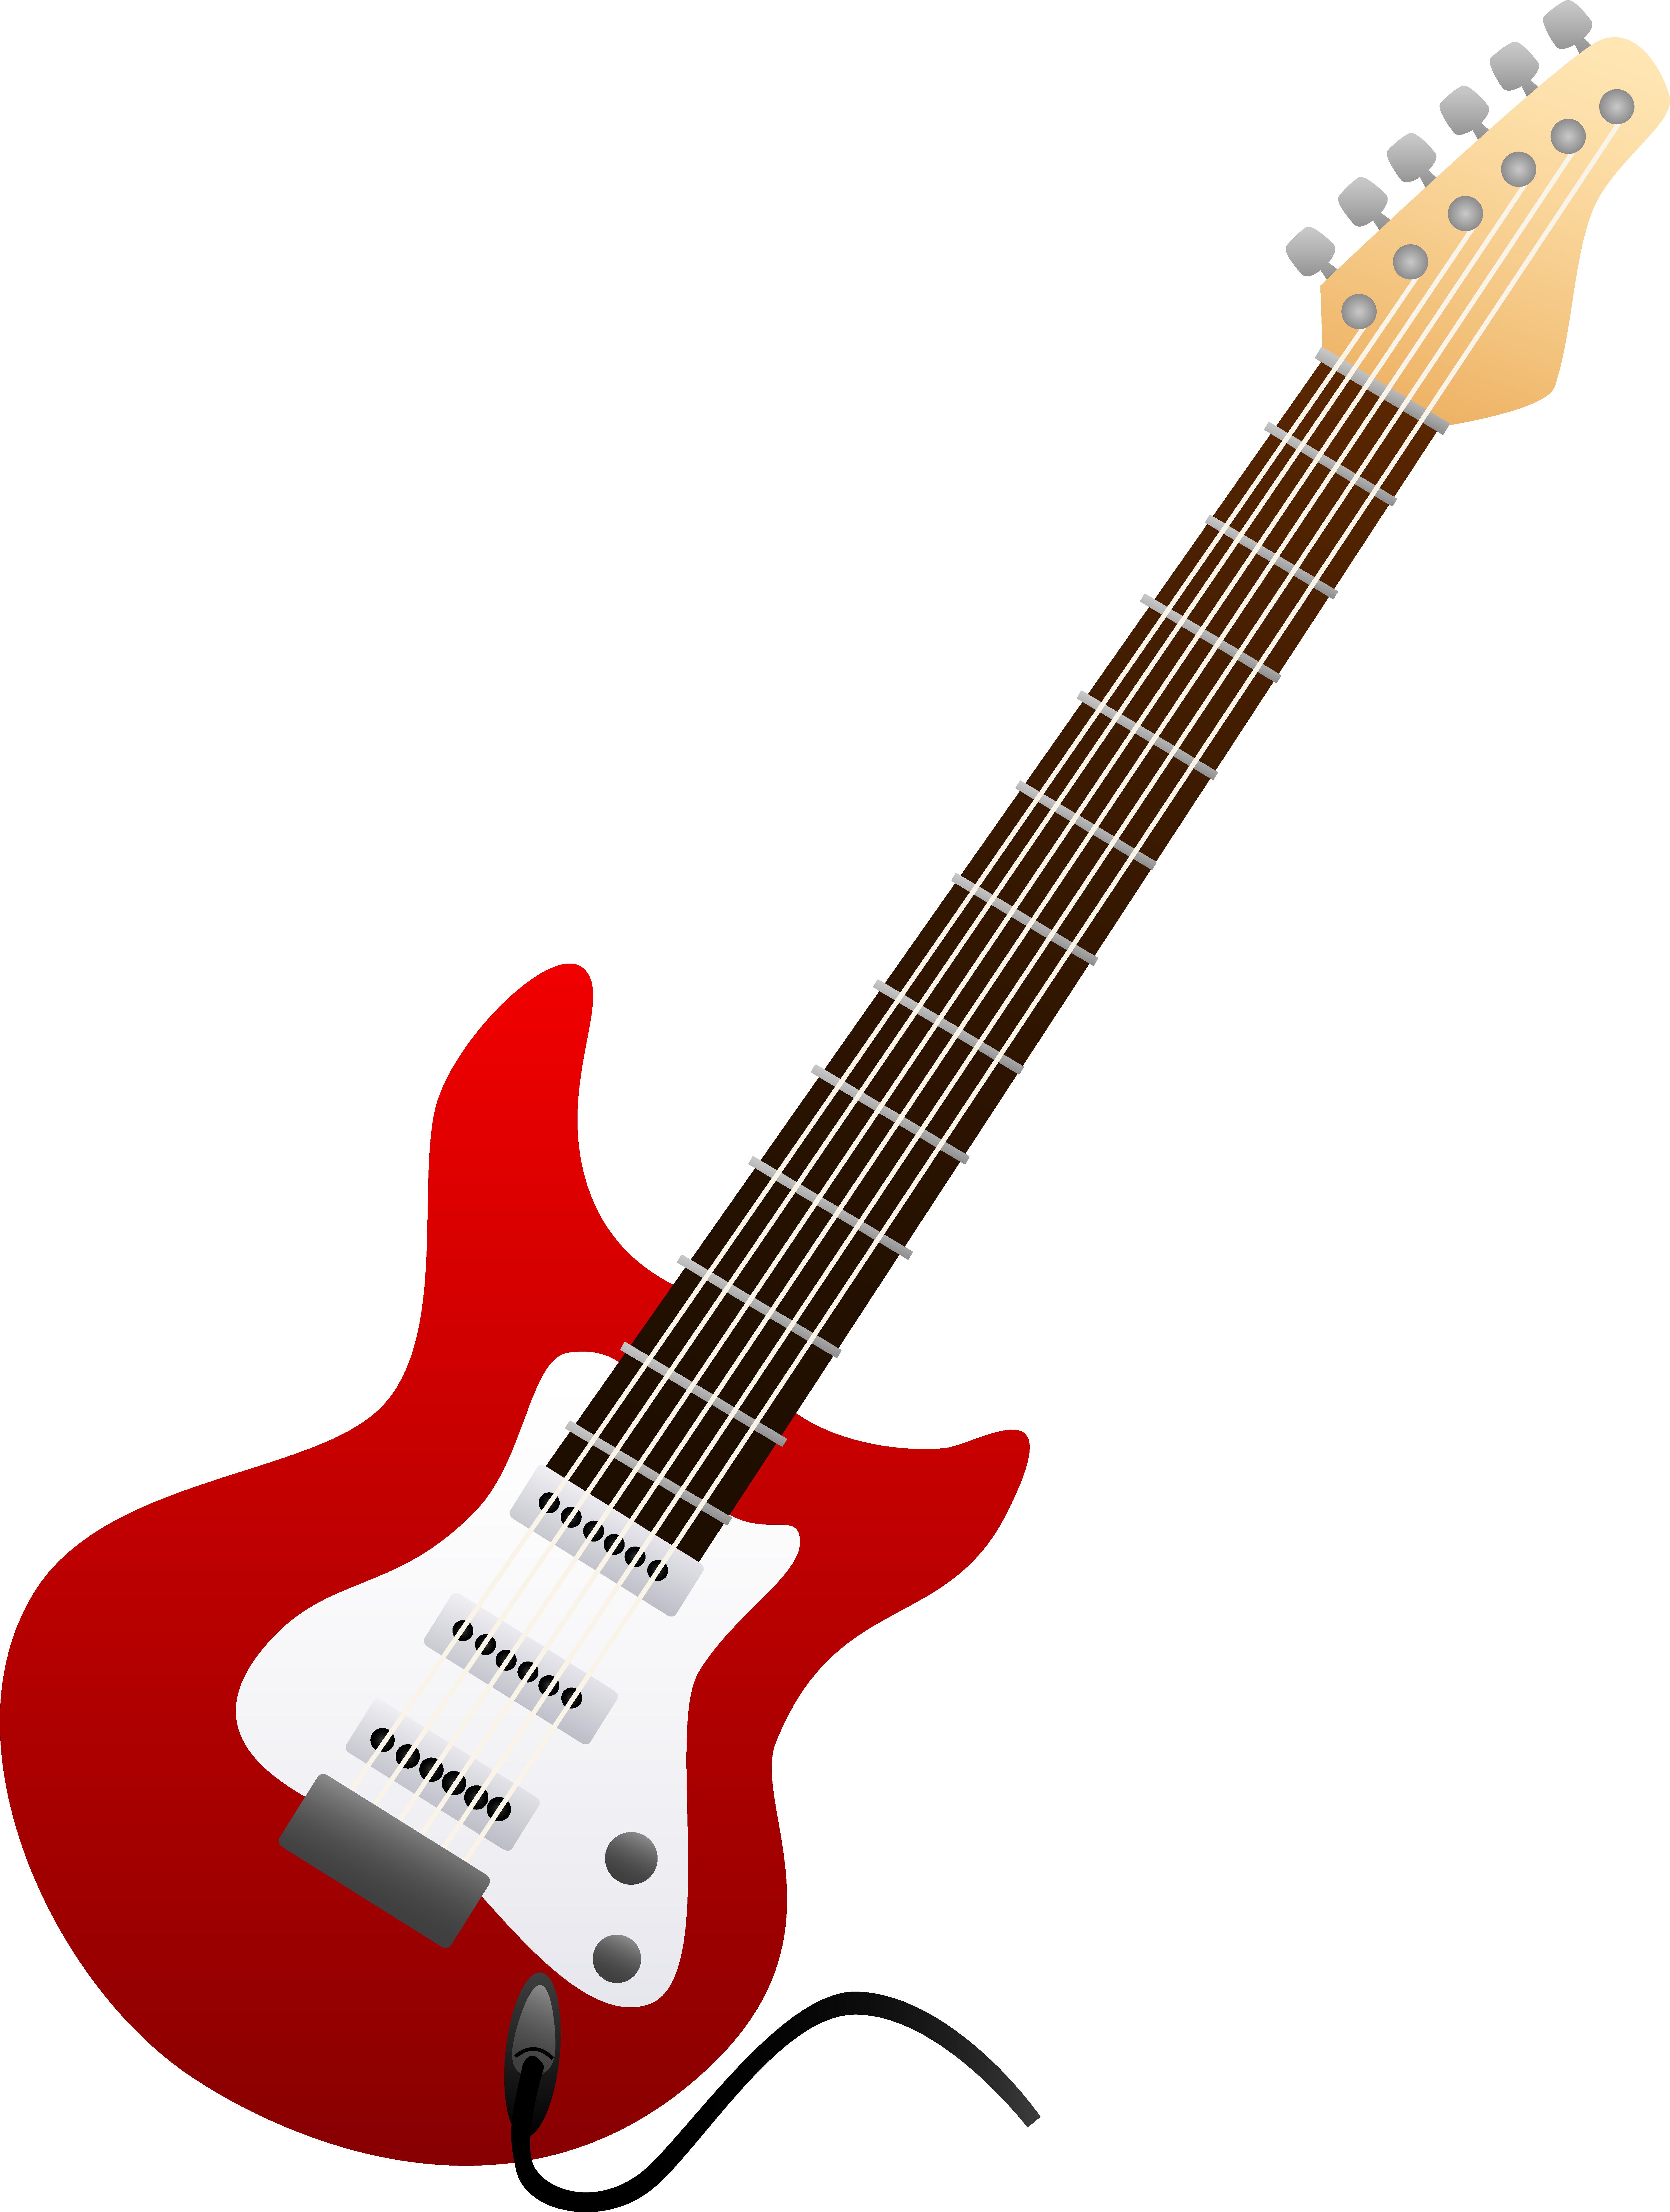 Rock Guitar Outline   Clipart Panda - Free Clipart Images